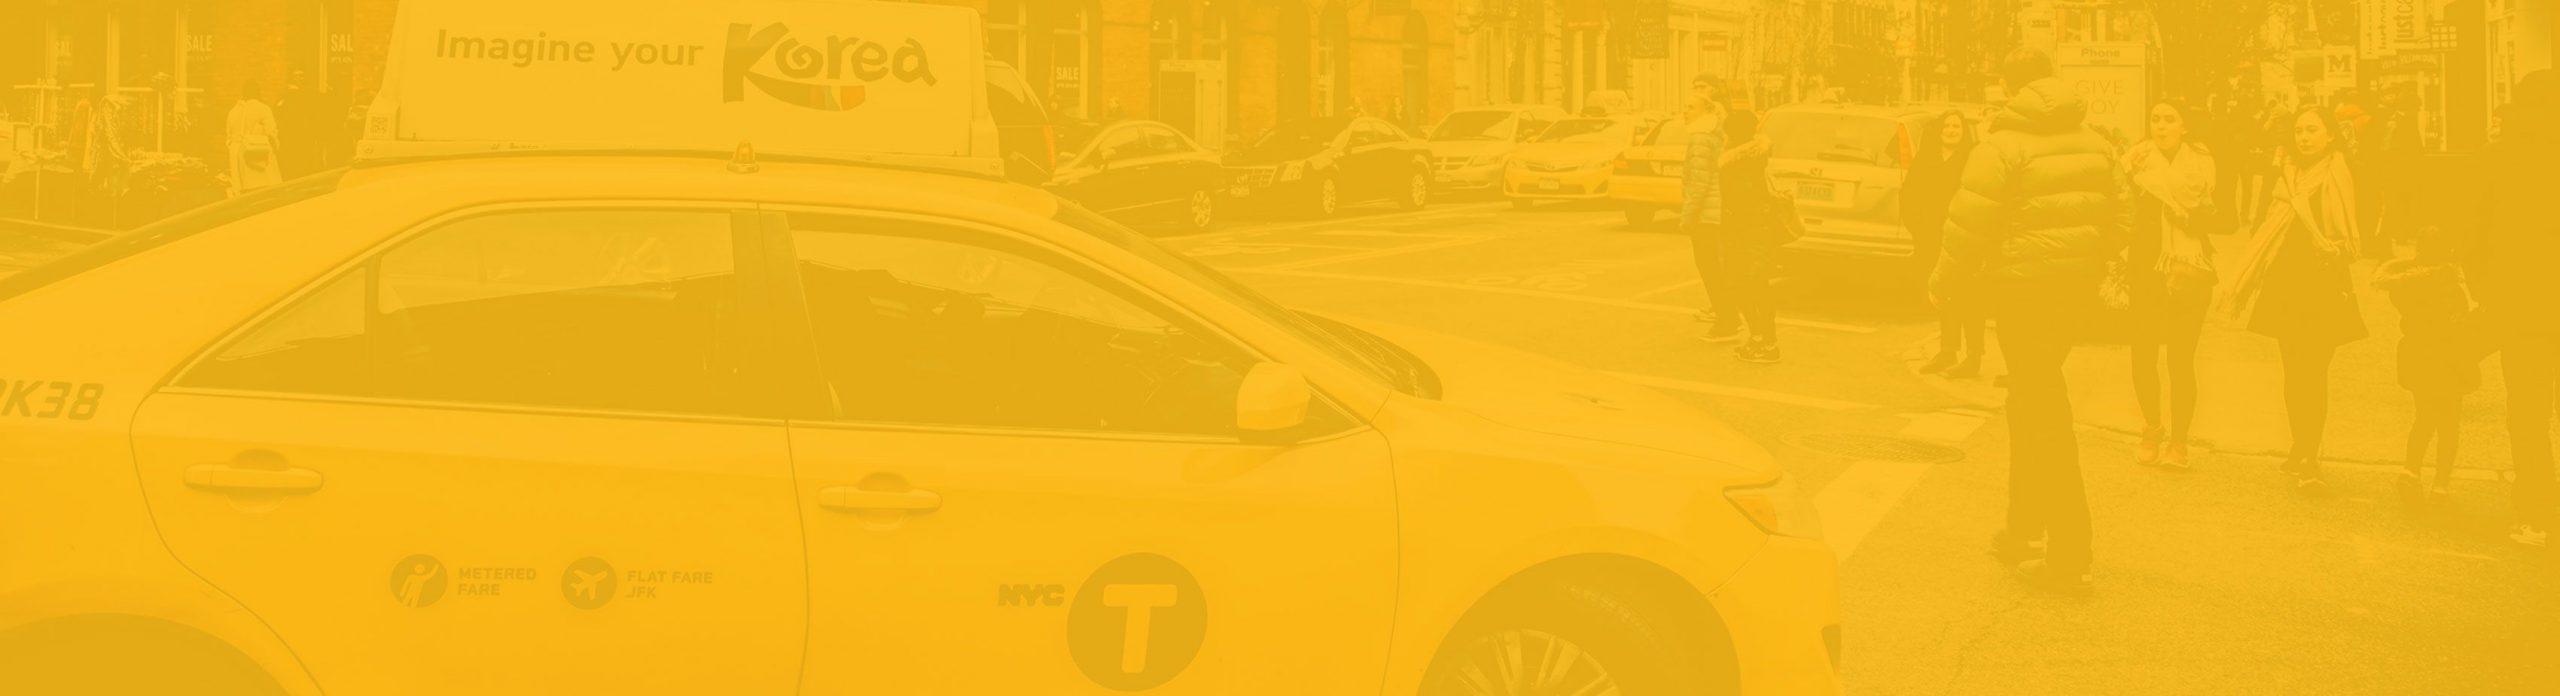 avada-taxi-cta-background